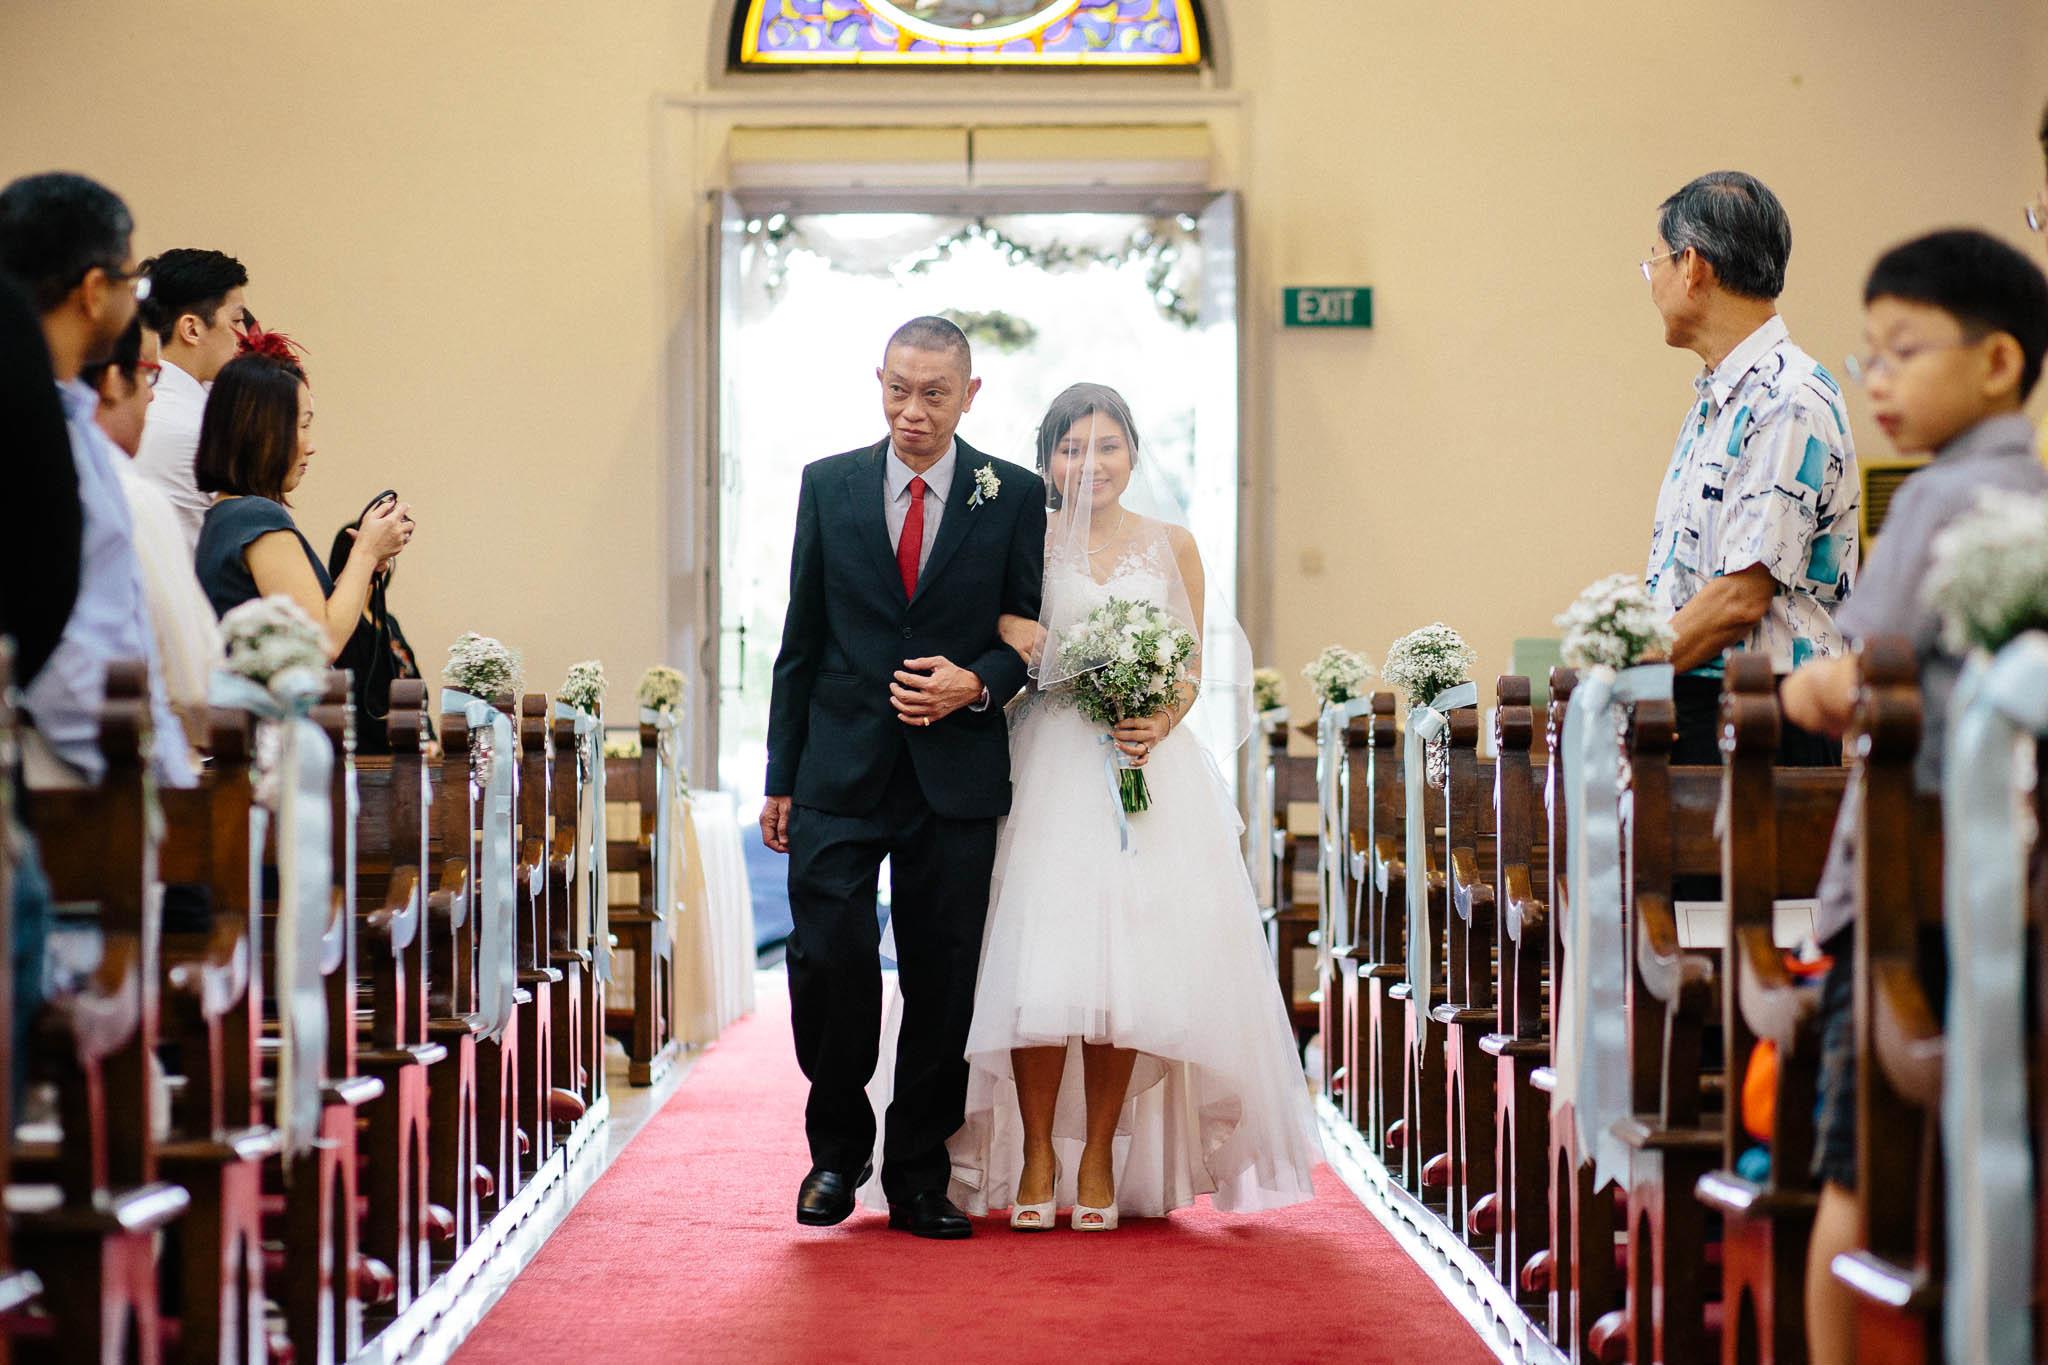 singapore-wedding-photographer-malay-indian-pre-wedding-travel-wmt-2015-jeremy-larissa-26.jpg